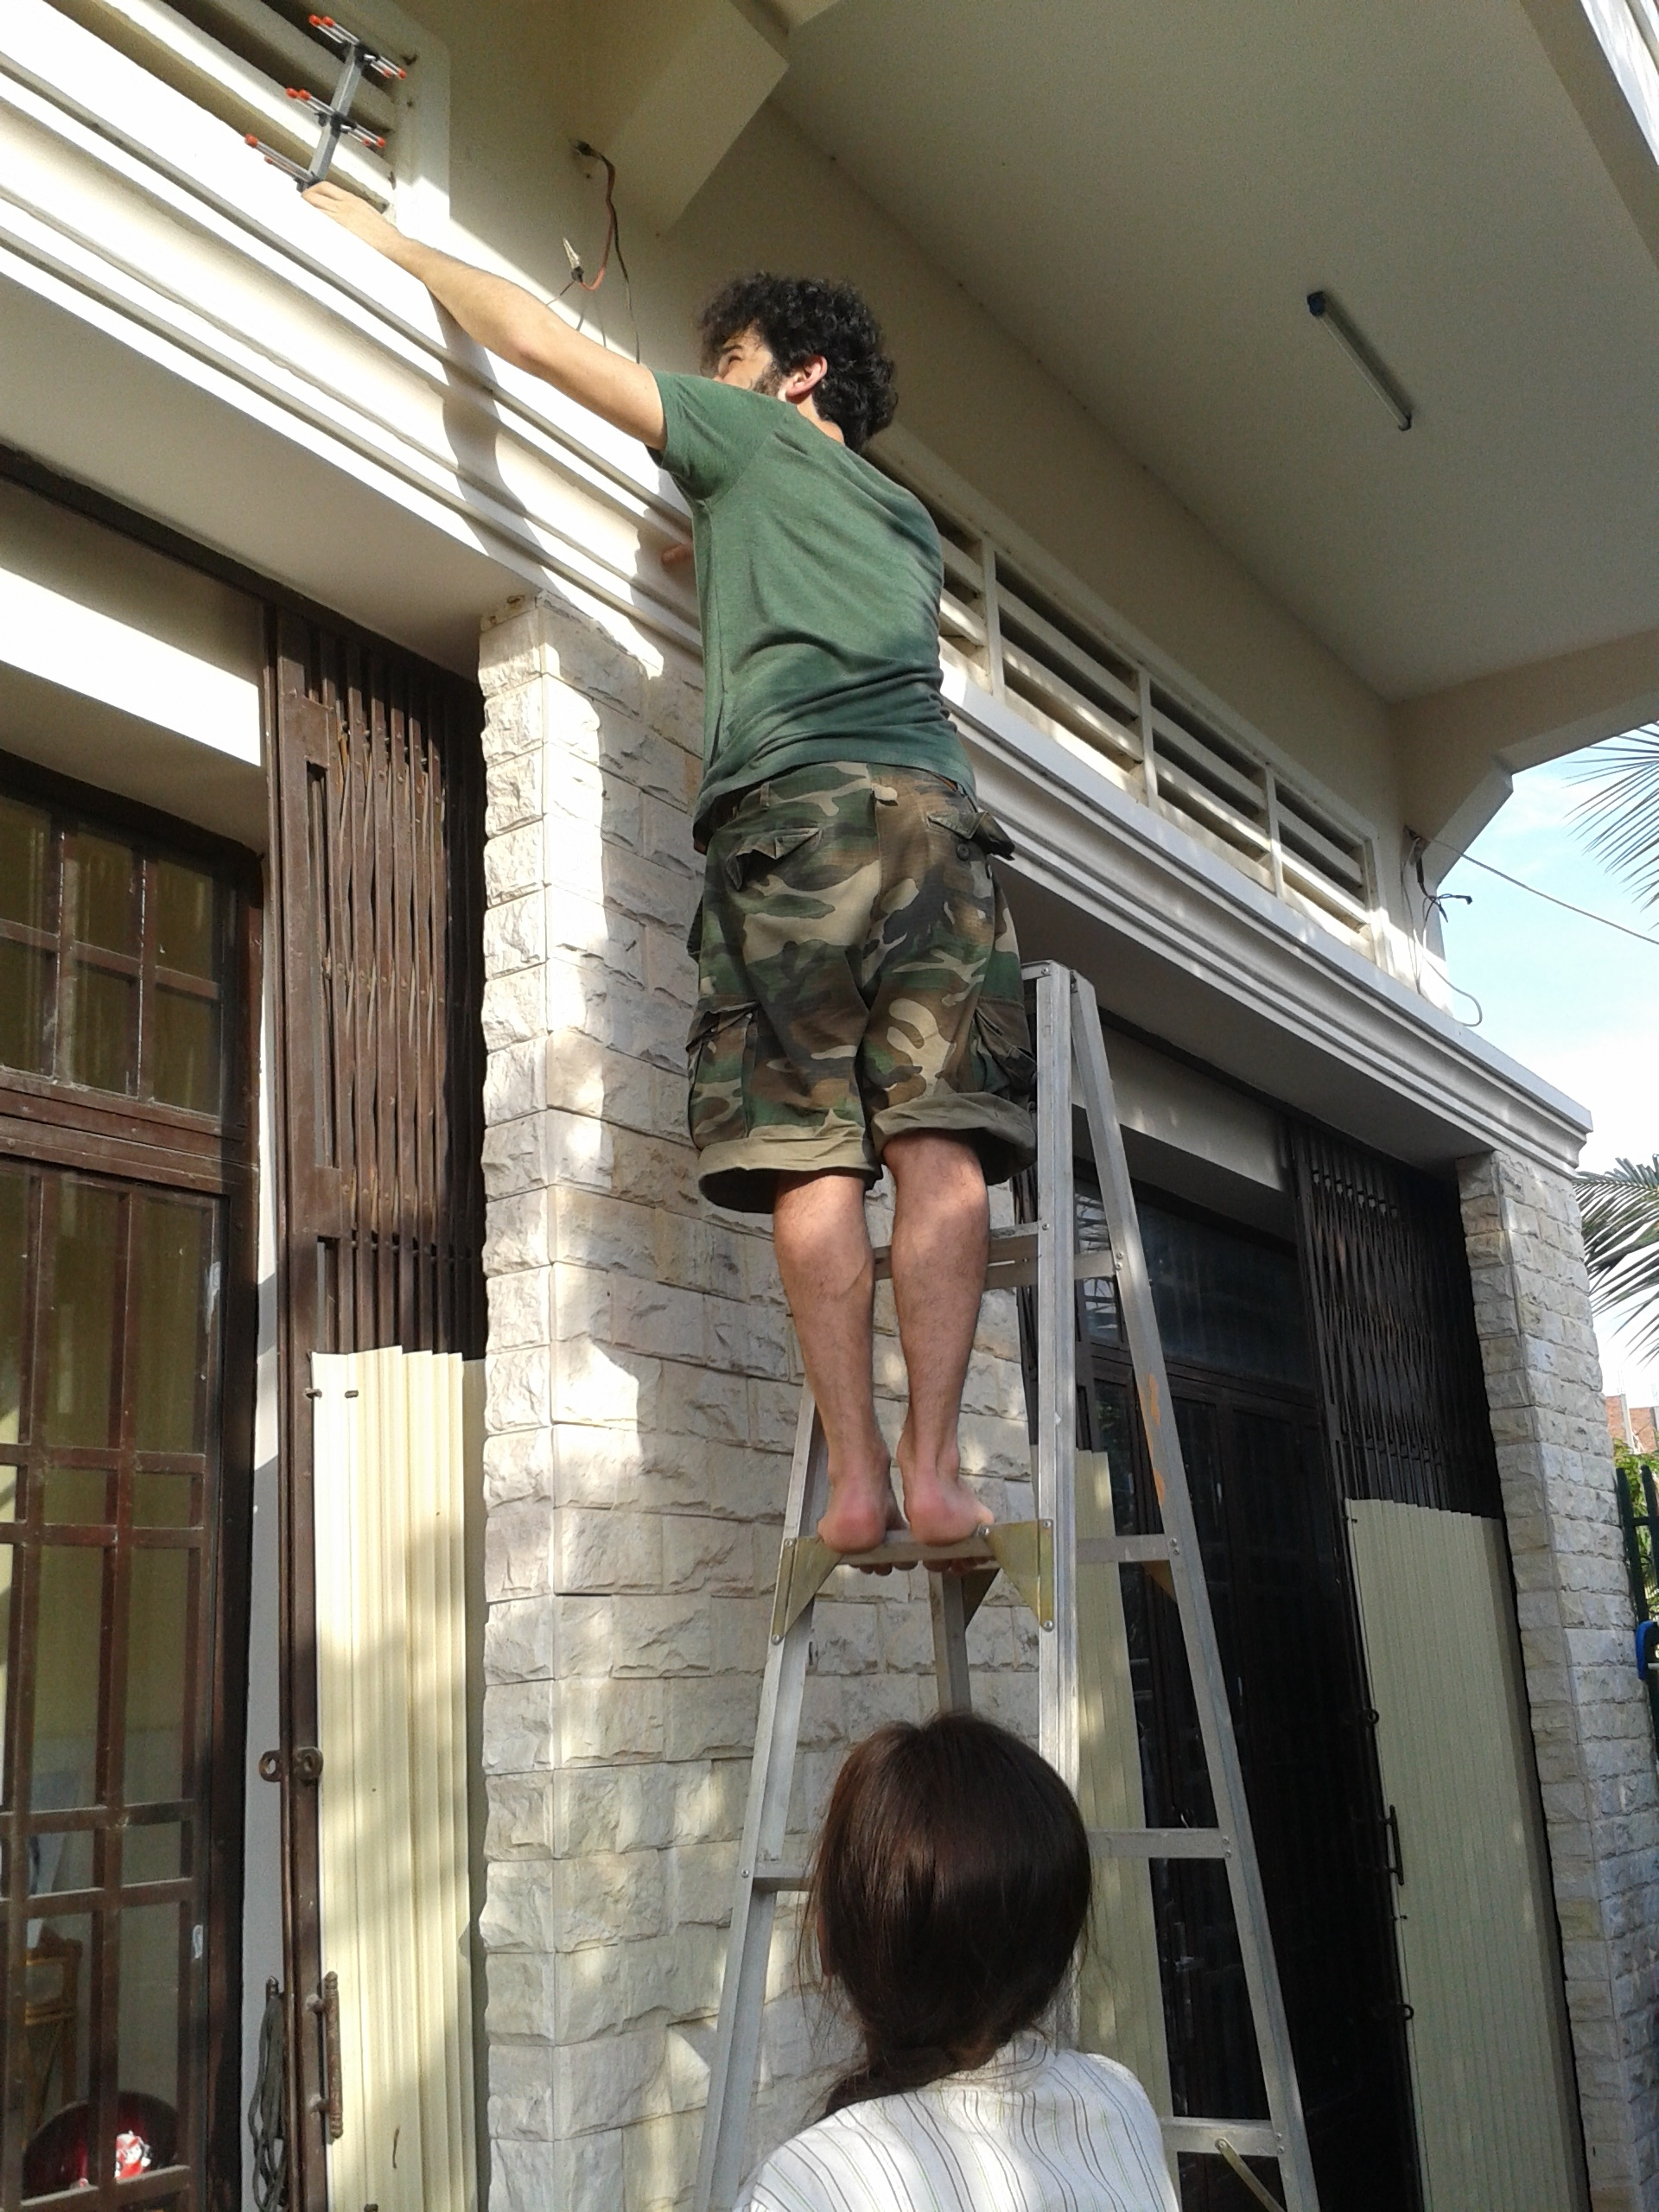 Riccardo, notre bénévole, installe l'antenne.